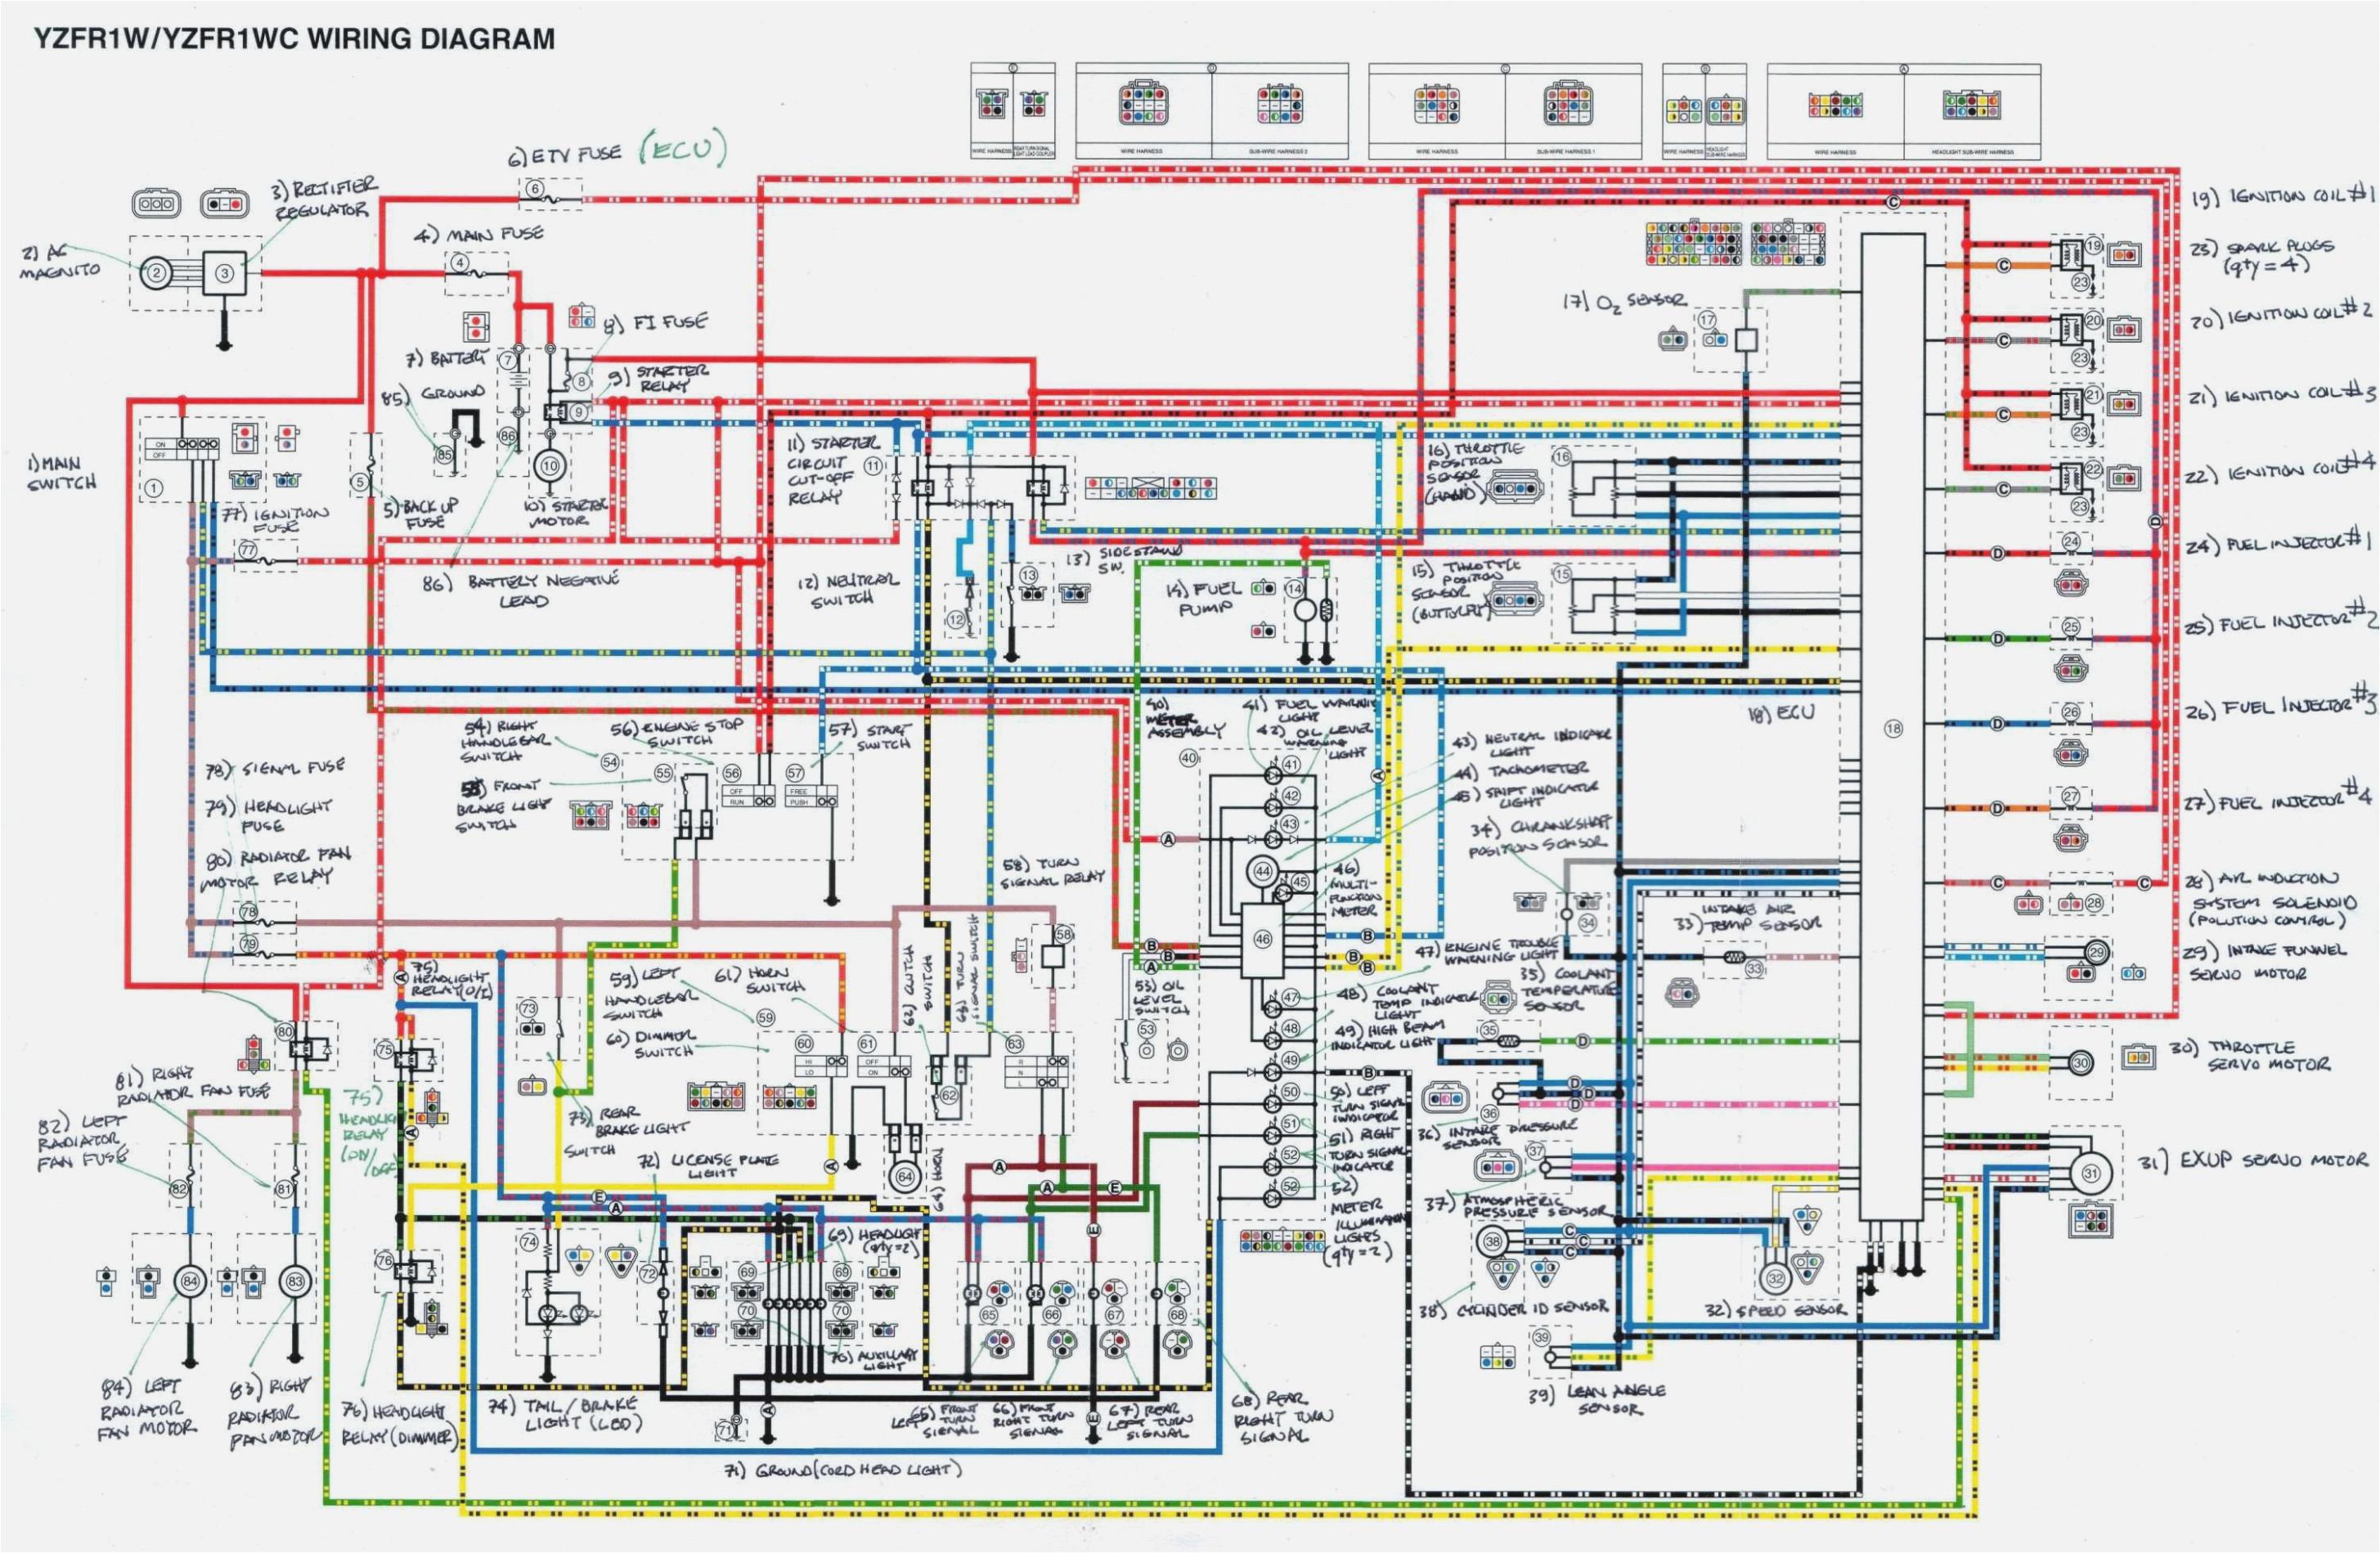 fuse box diagram 1979 yamaha 1100 data schematic diagram 2005 yamaha r1 fuse box diagram yamaha fuse box diagram